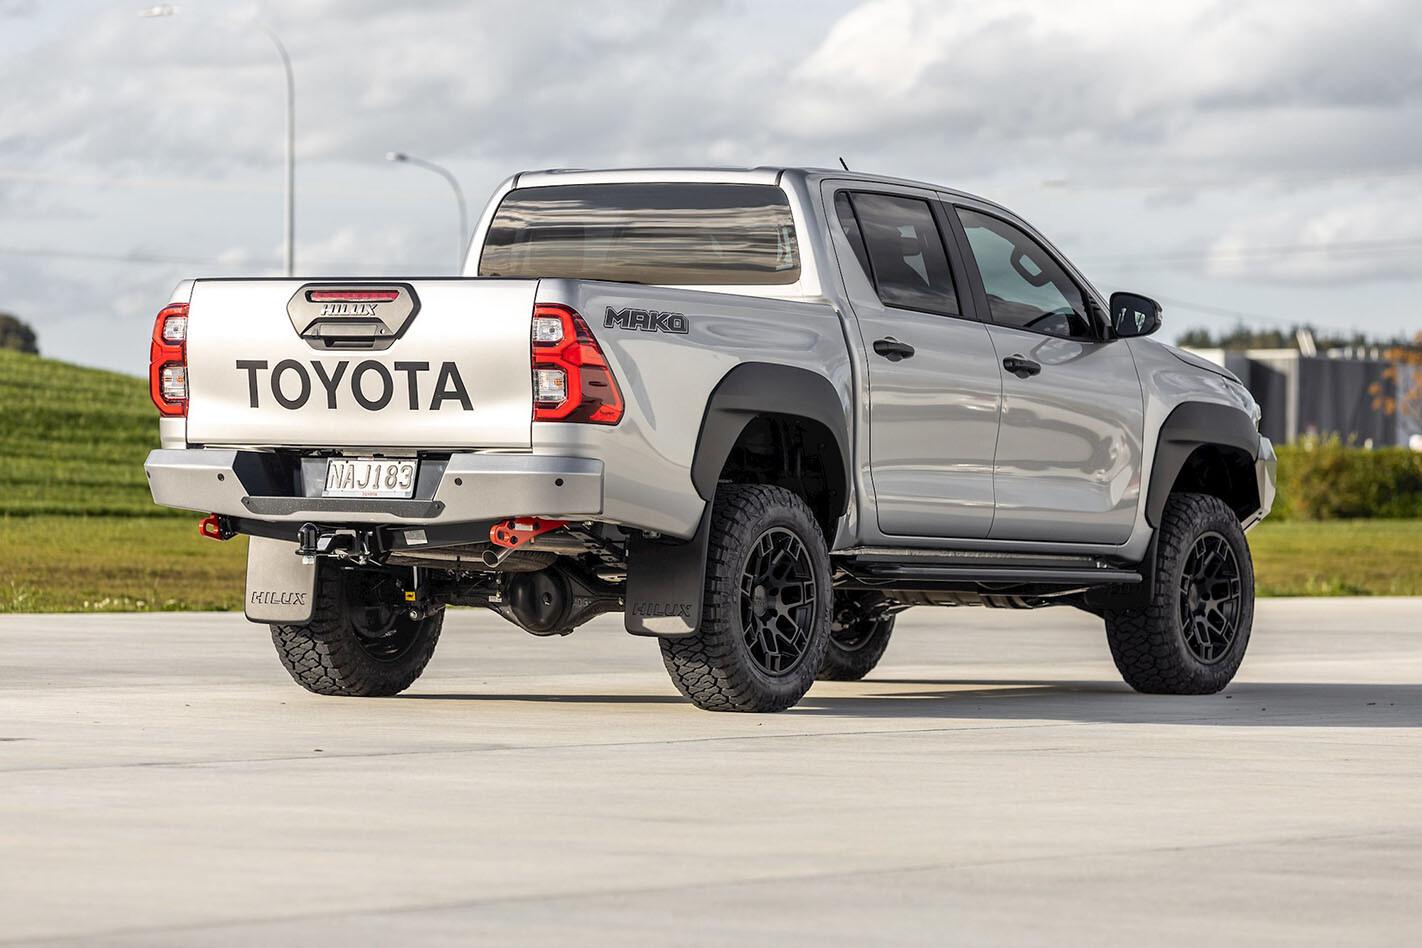 Toyota Hilux Mako rear